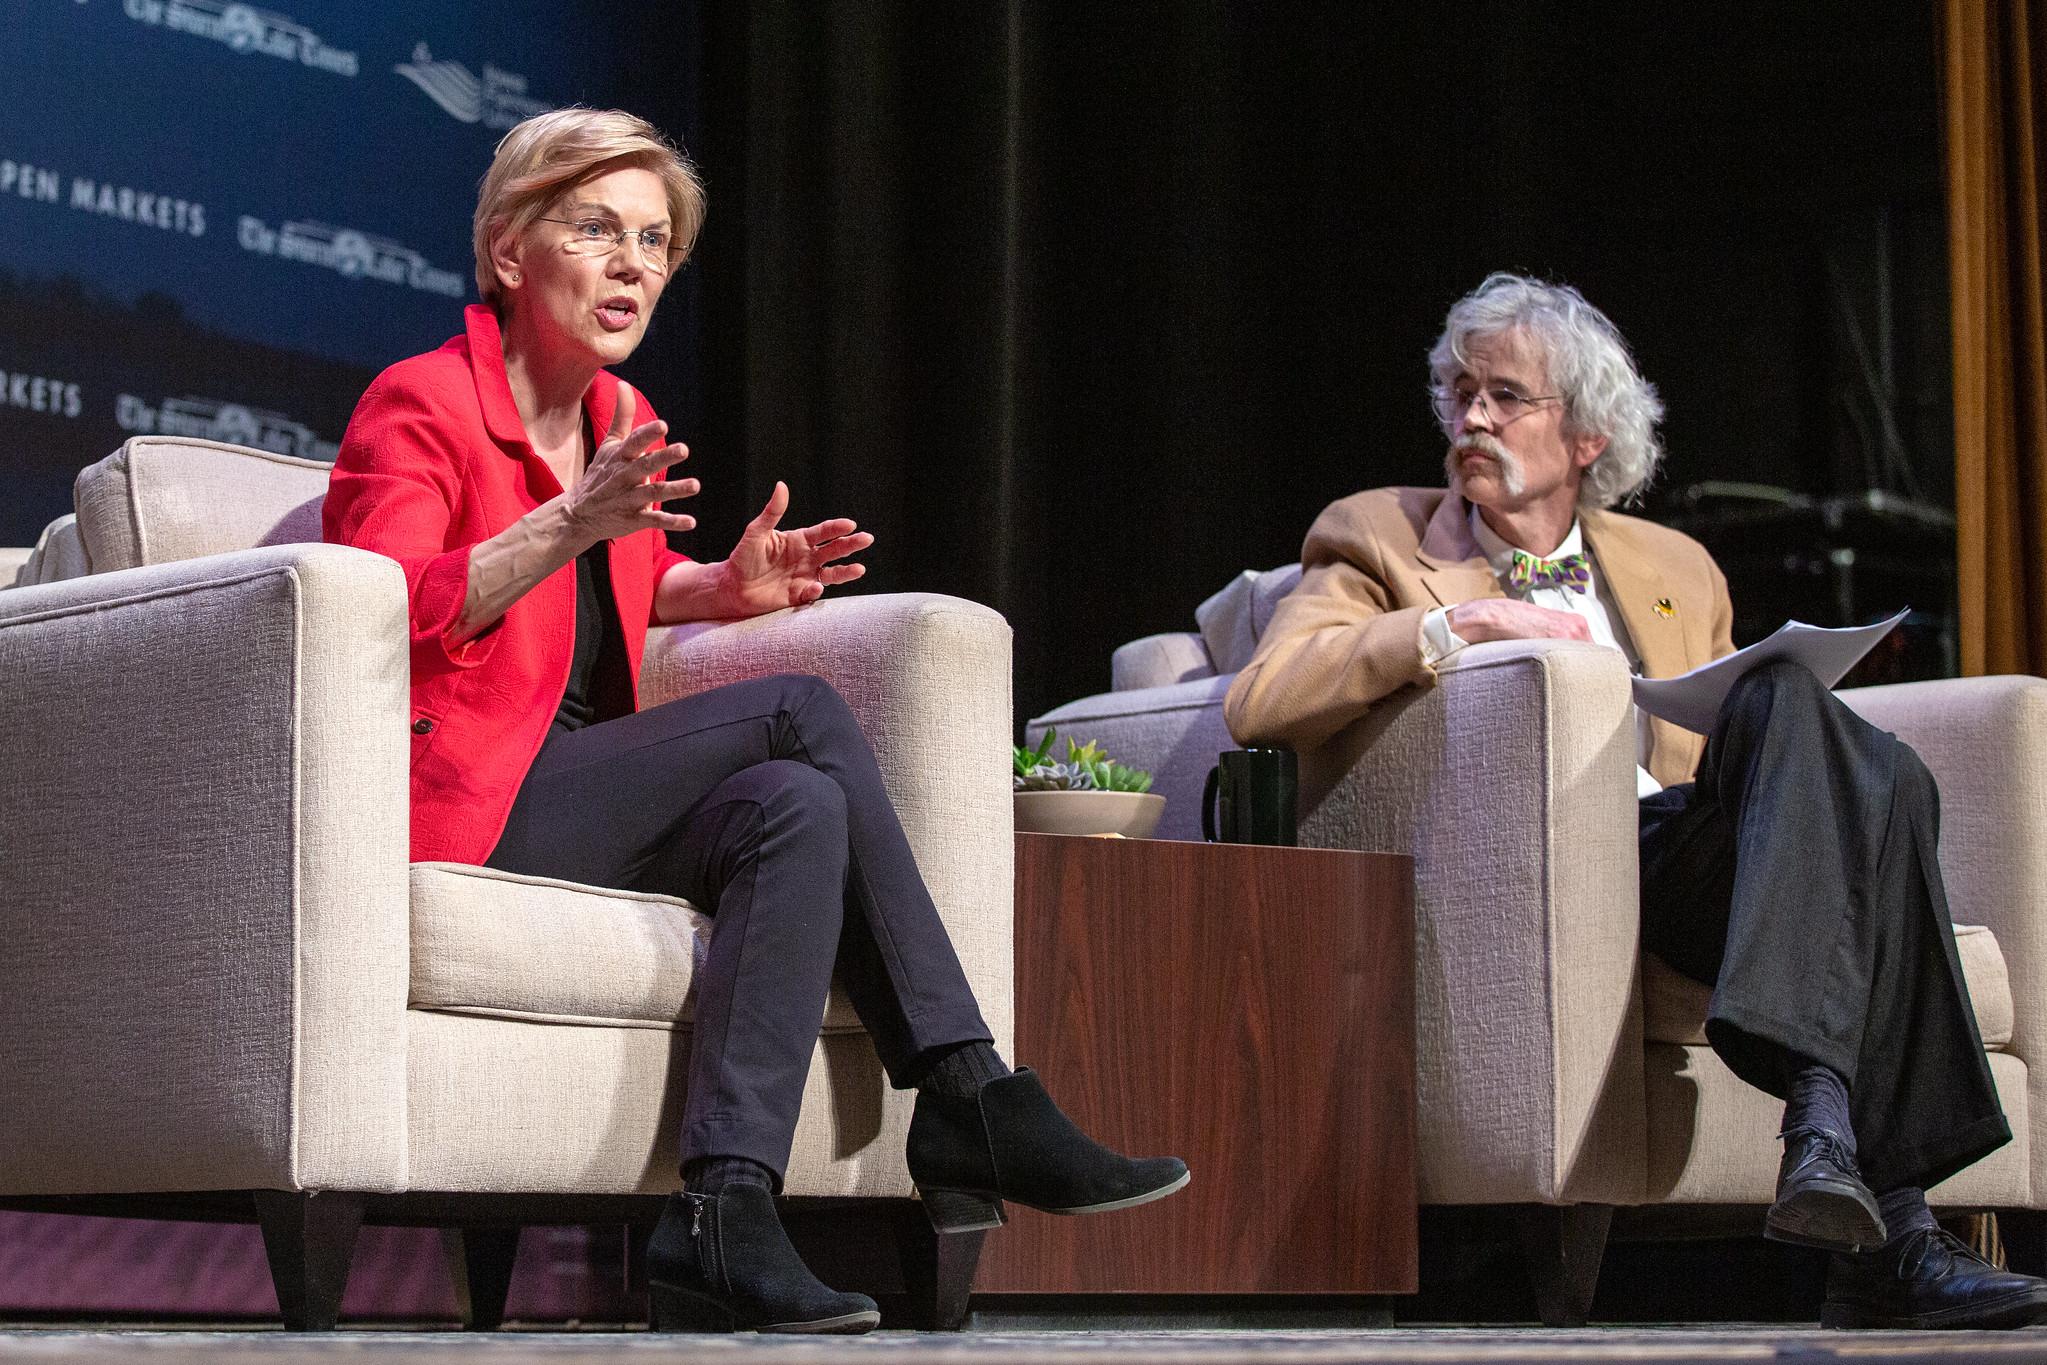 Warren speaks at the Heartland Forum in Storm Lake, Iowa